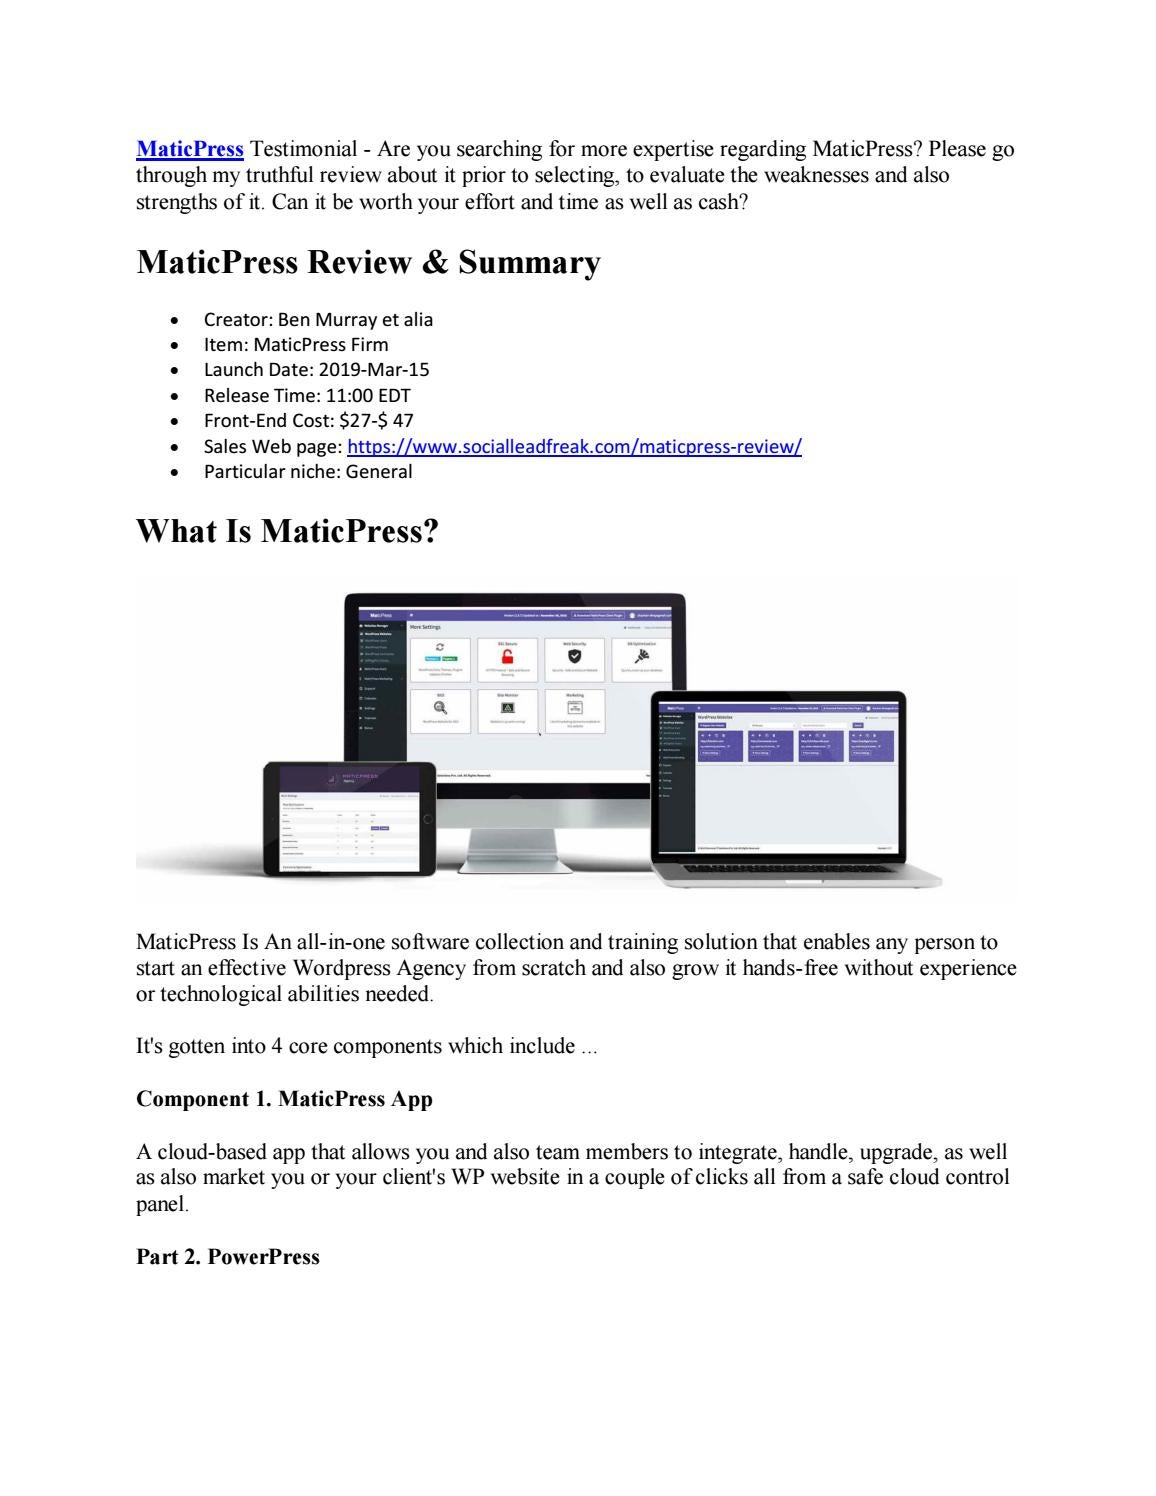 MaticPress Review Should I Grab It by richardlarue - issuu